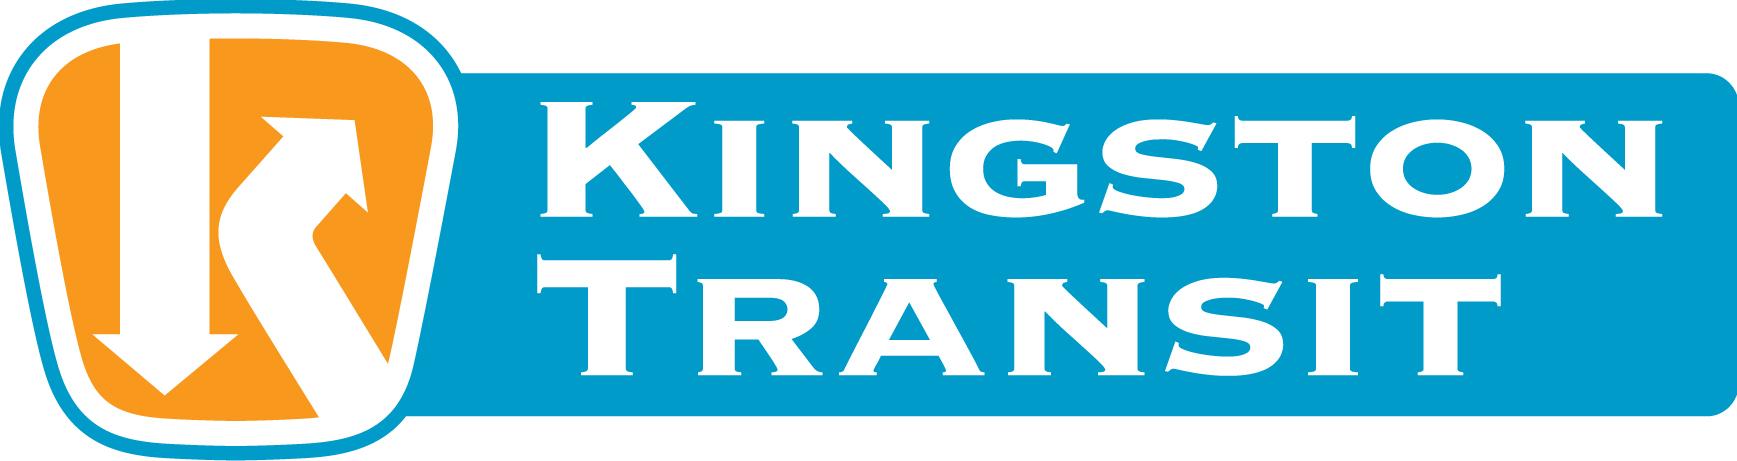 kingstontransit.png